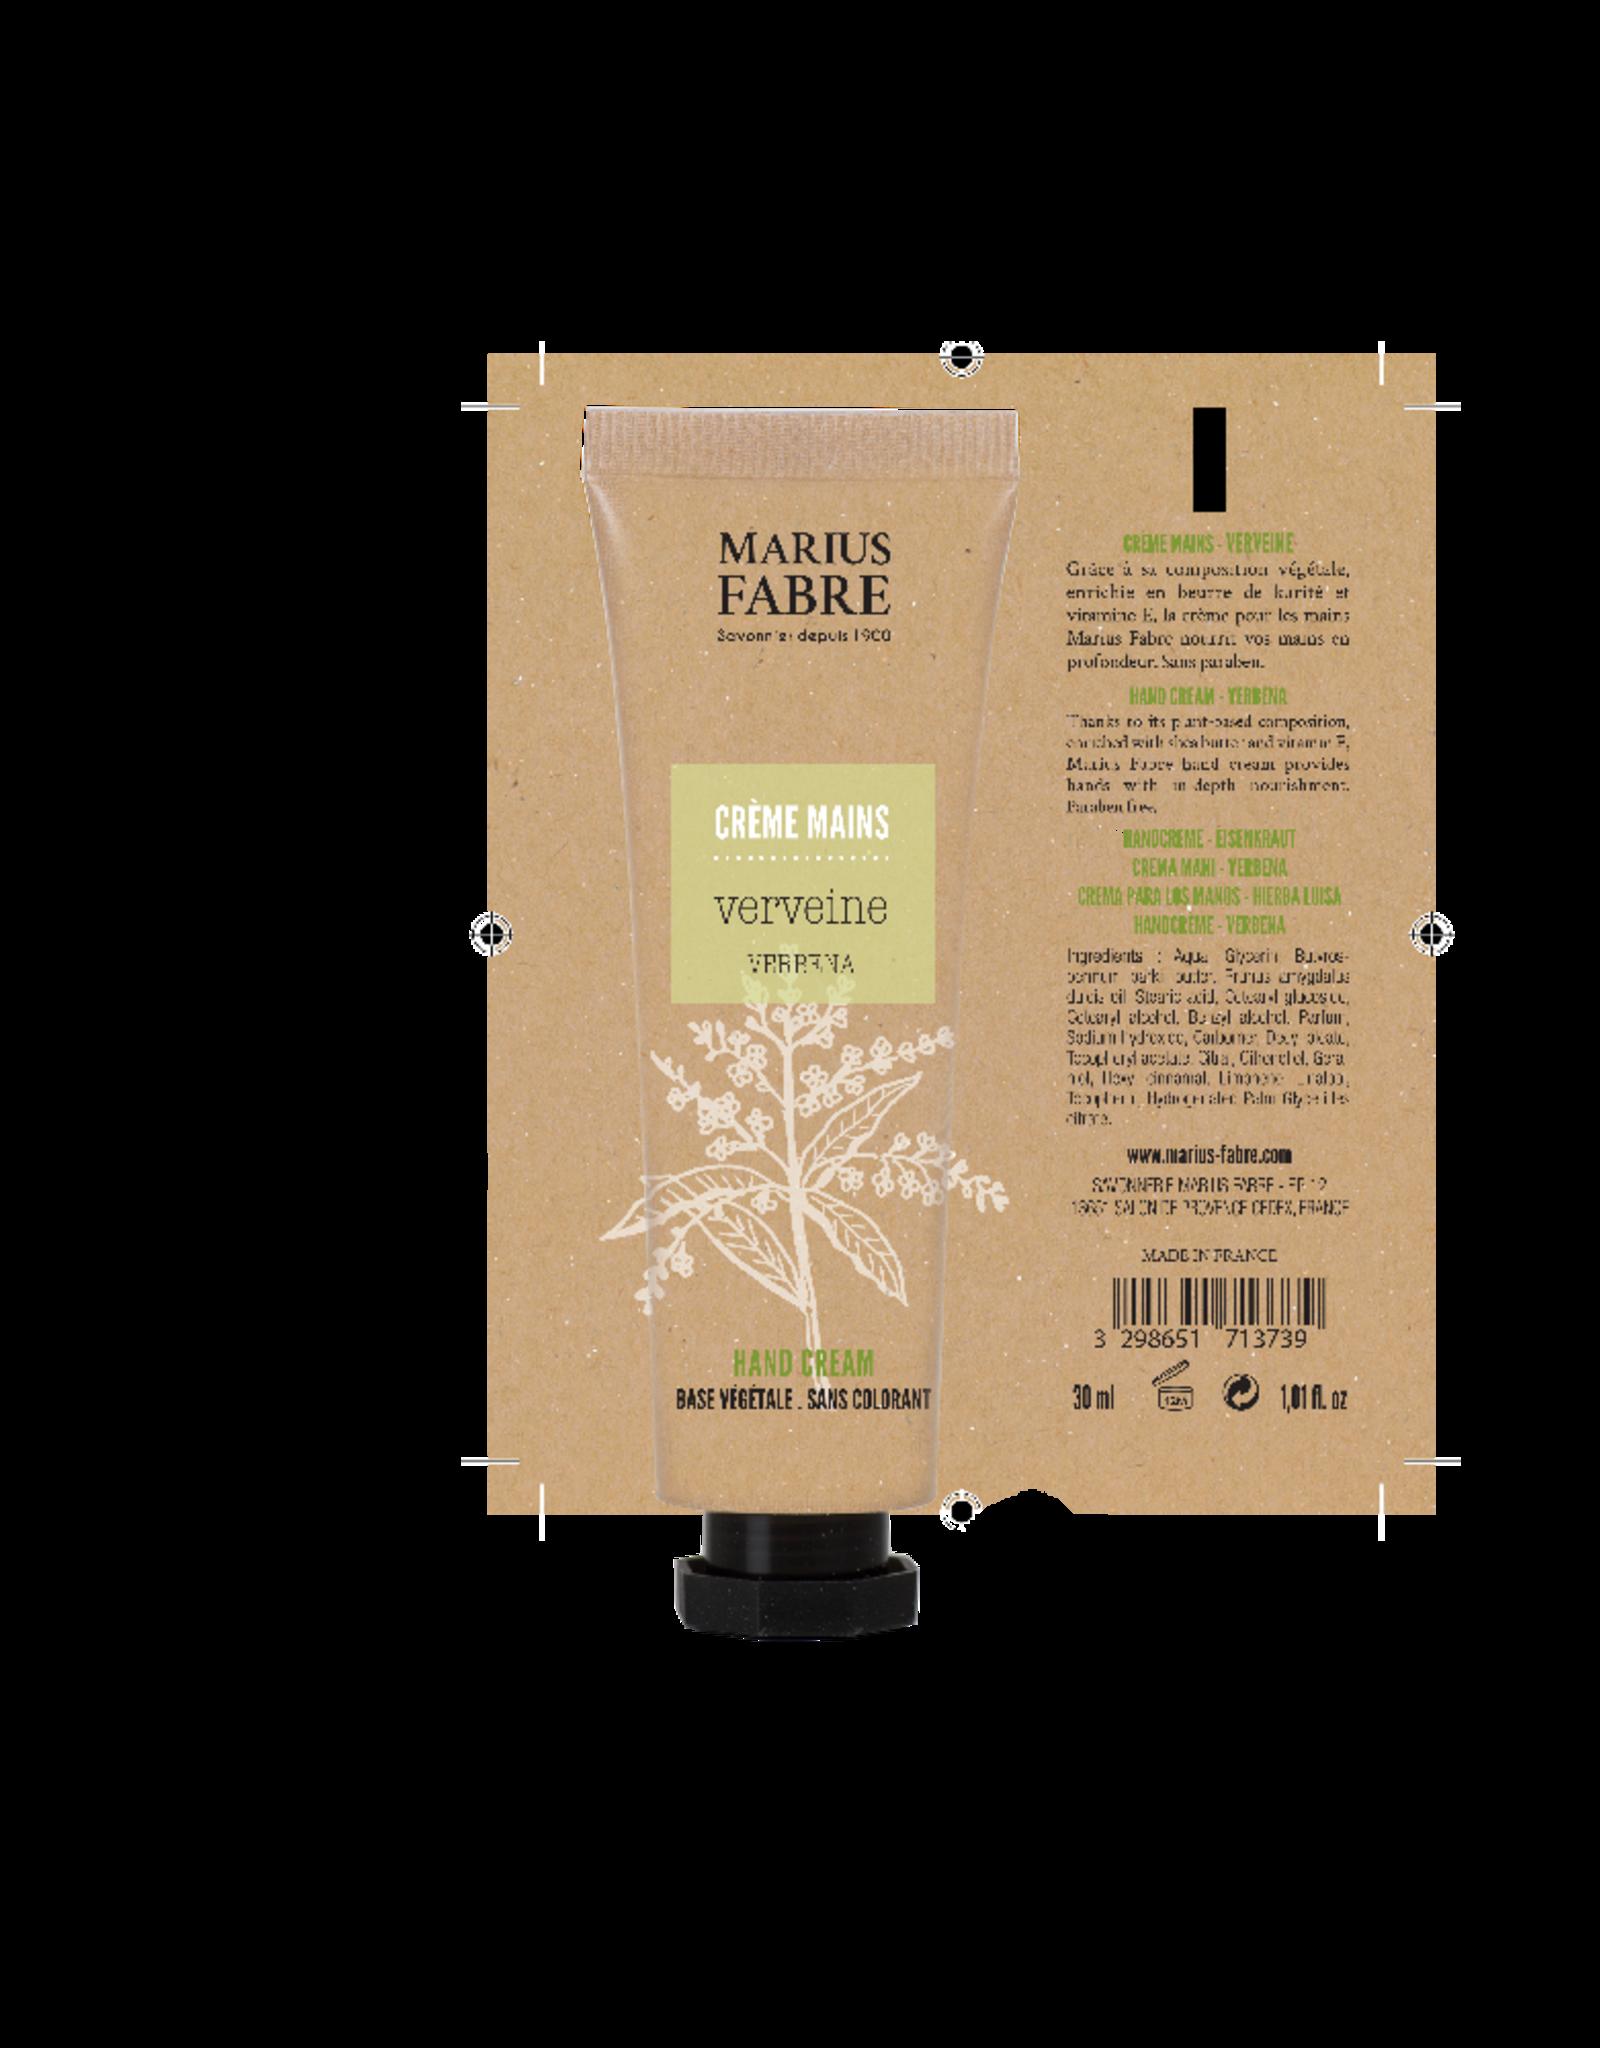 Marius Fabre Verbena fine hand cream - olive oil base (30 ml)